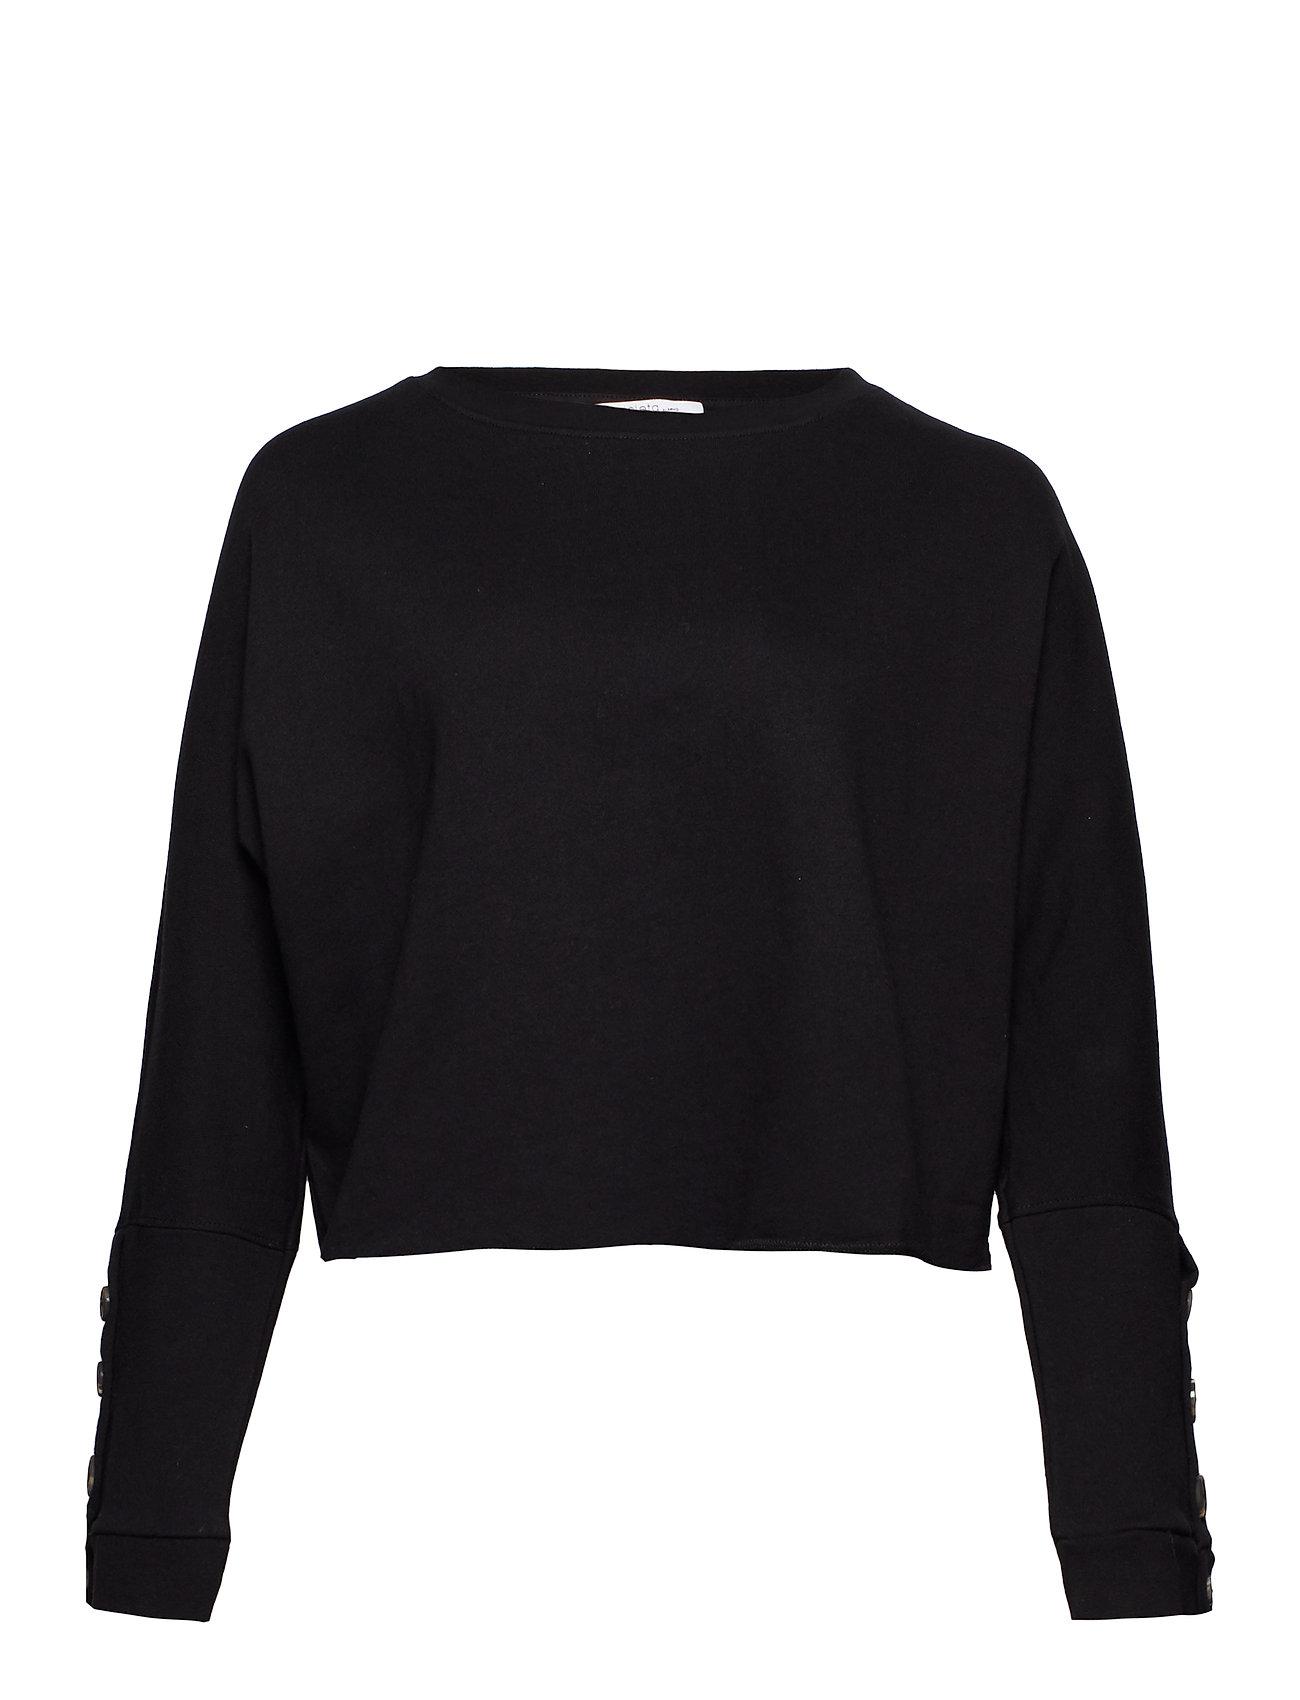 Violeta by Mango Dolman sleeve sweatshirt - BLACK